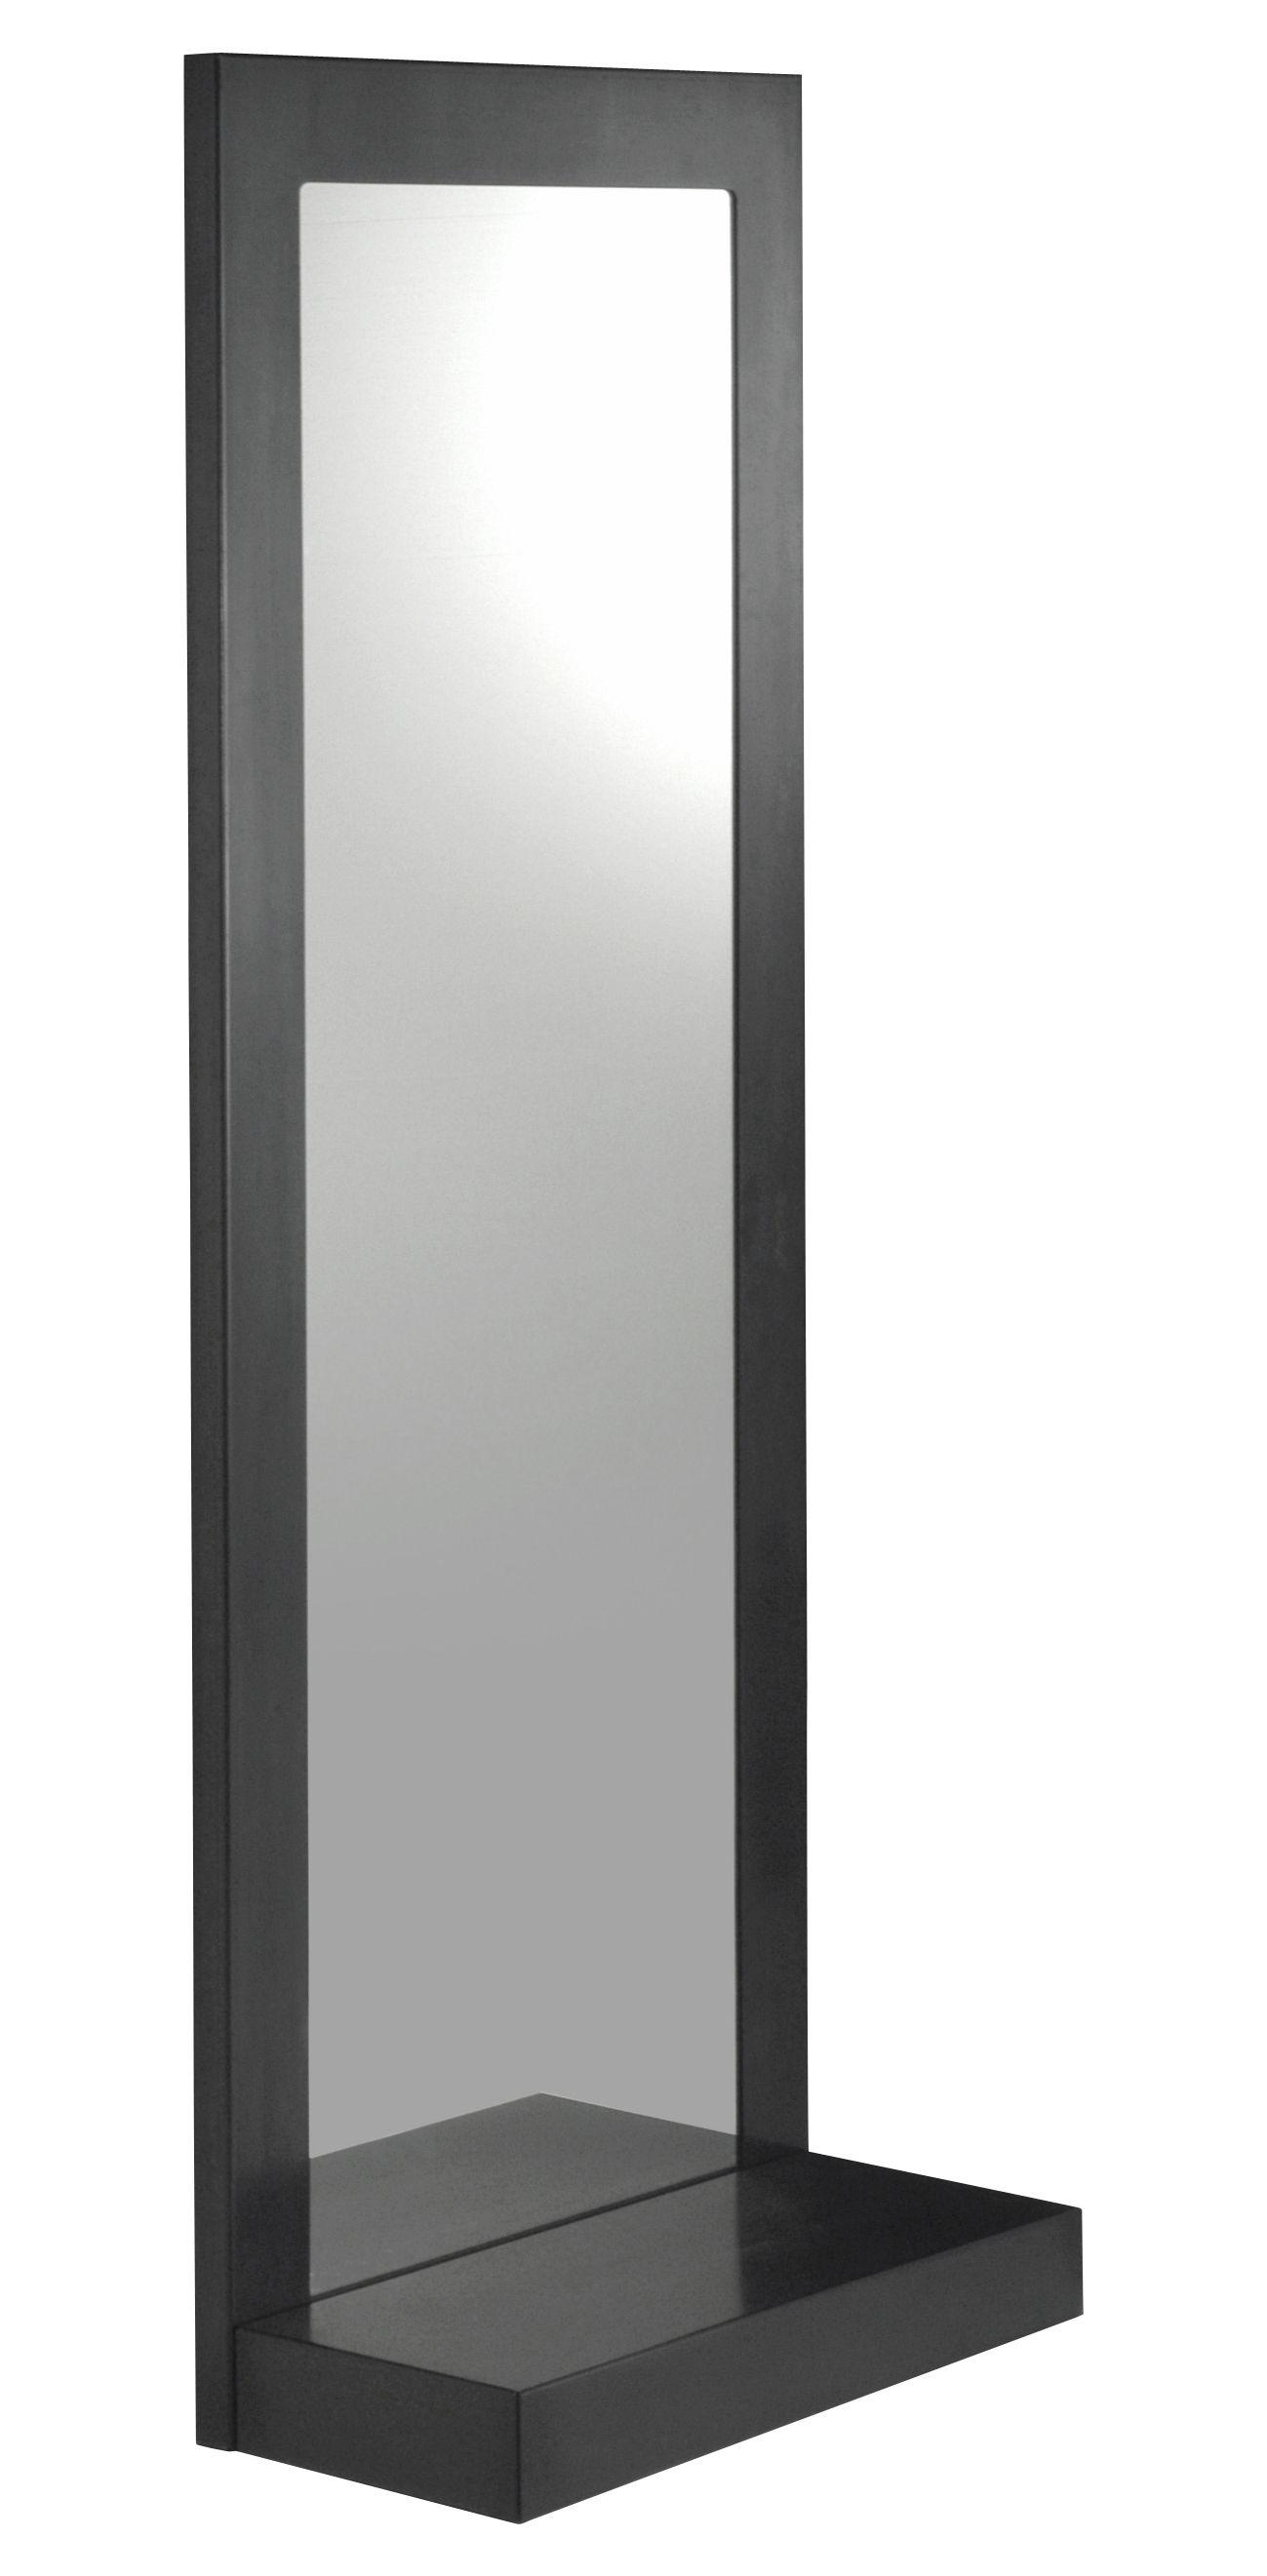 Frame wall mirror 180 x 70 cm by zeus for Miroir 70 x 70